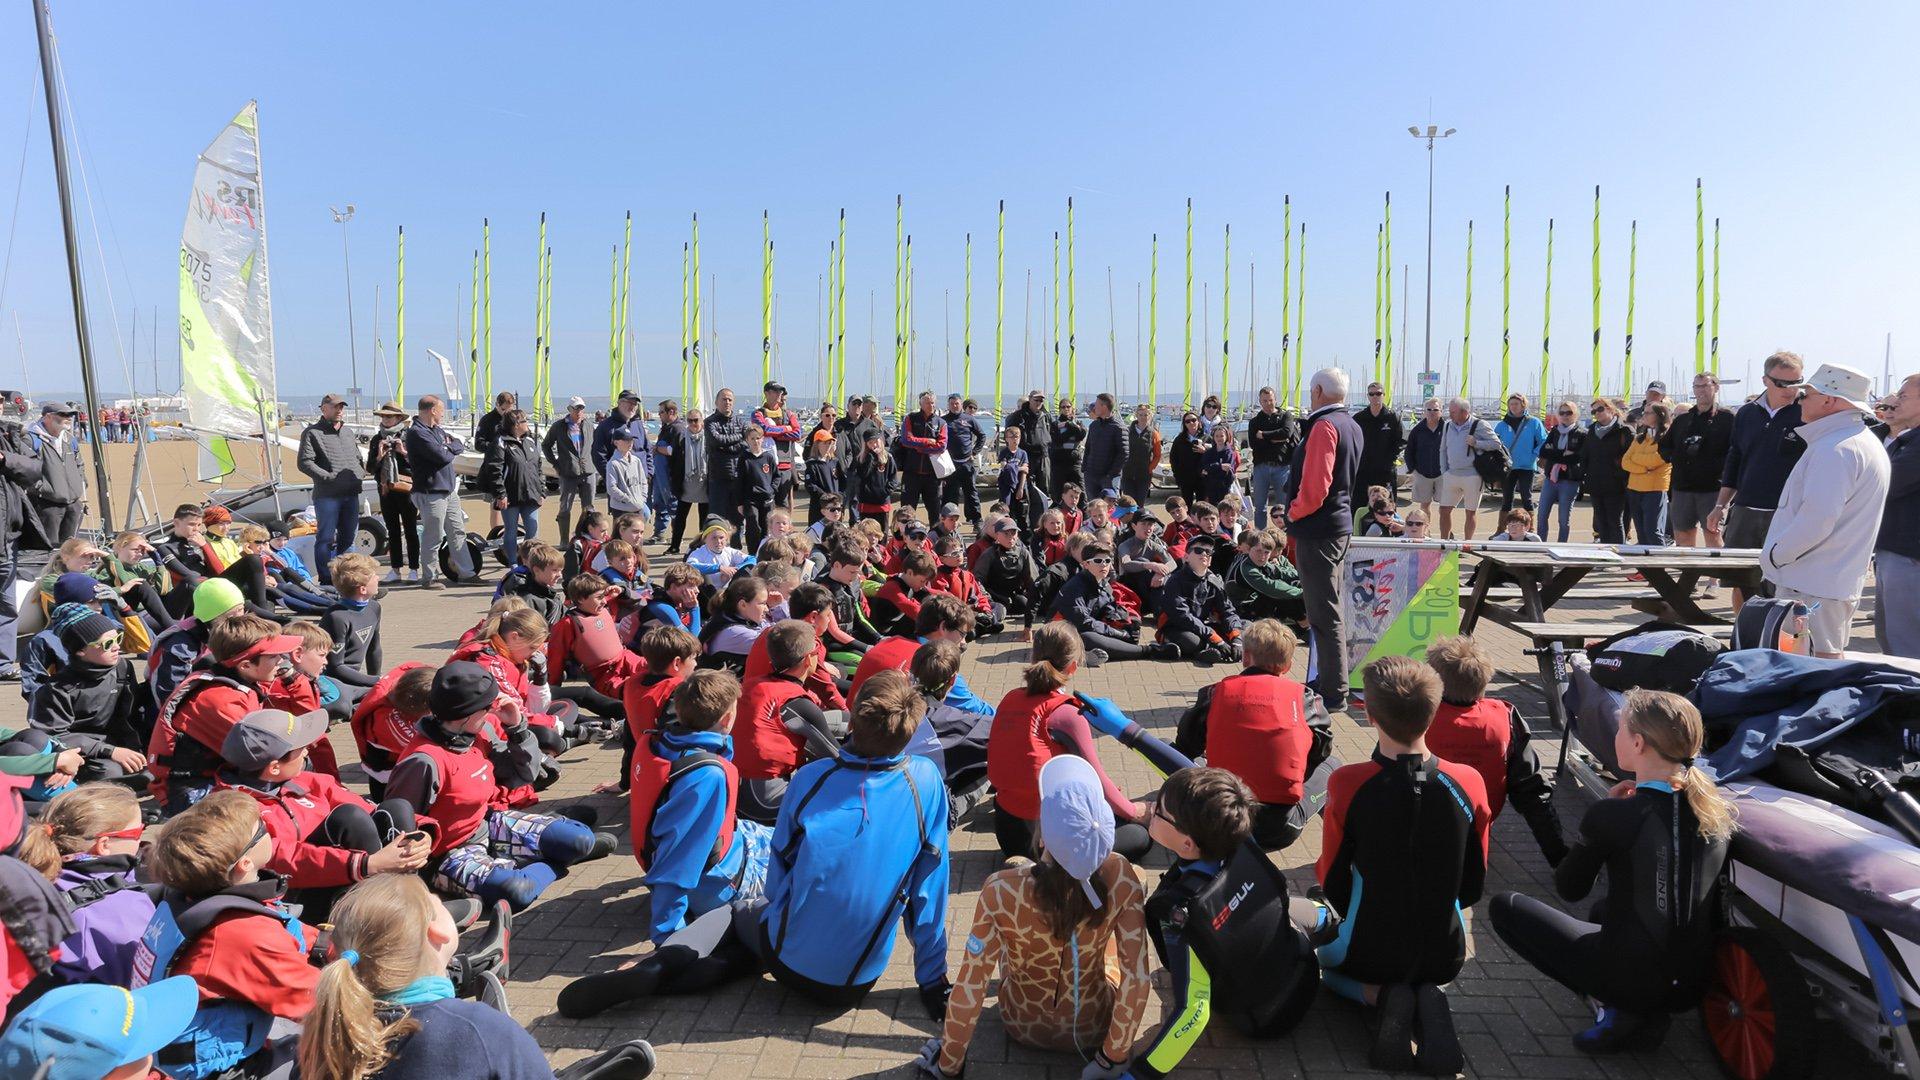 WPNSA - 2012 Olympic Sailing Venue